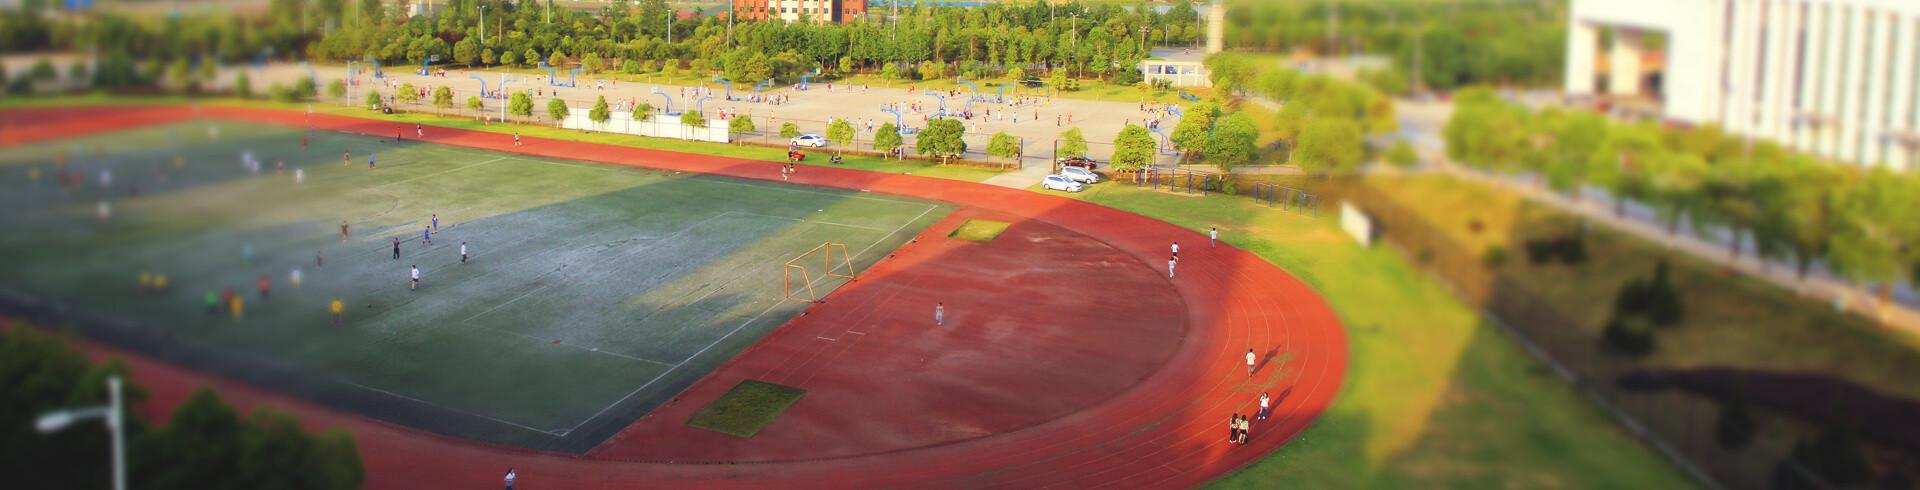 Nanchang University Sports Area